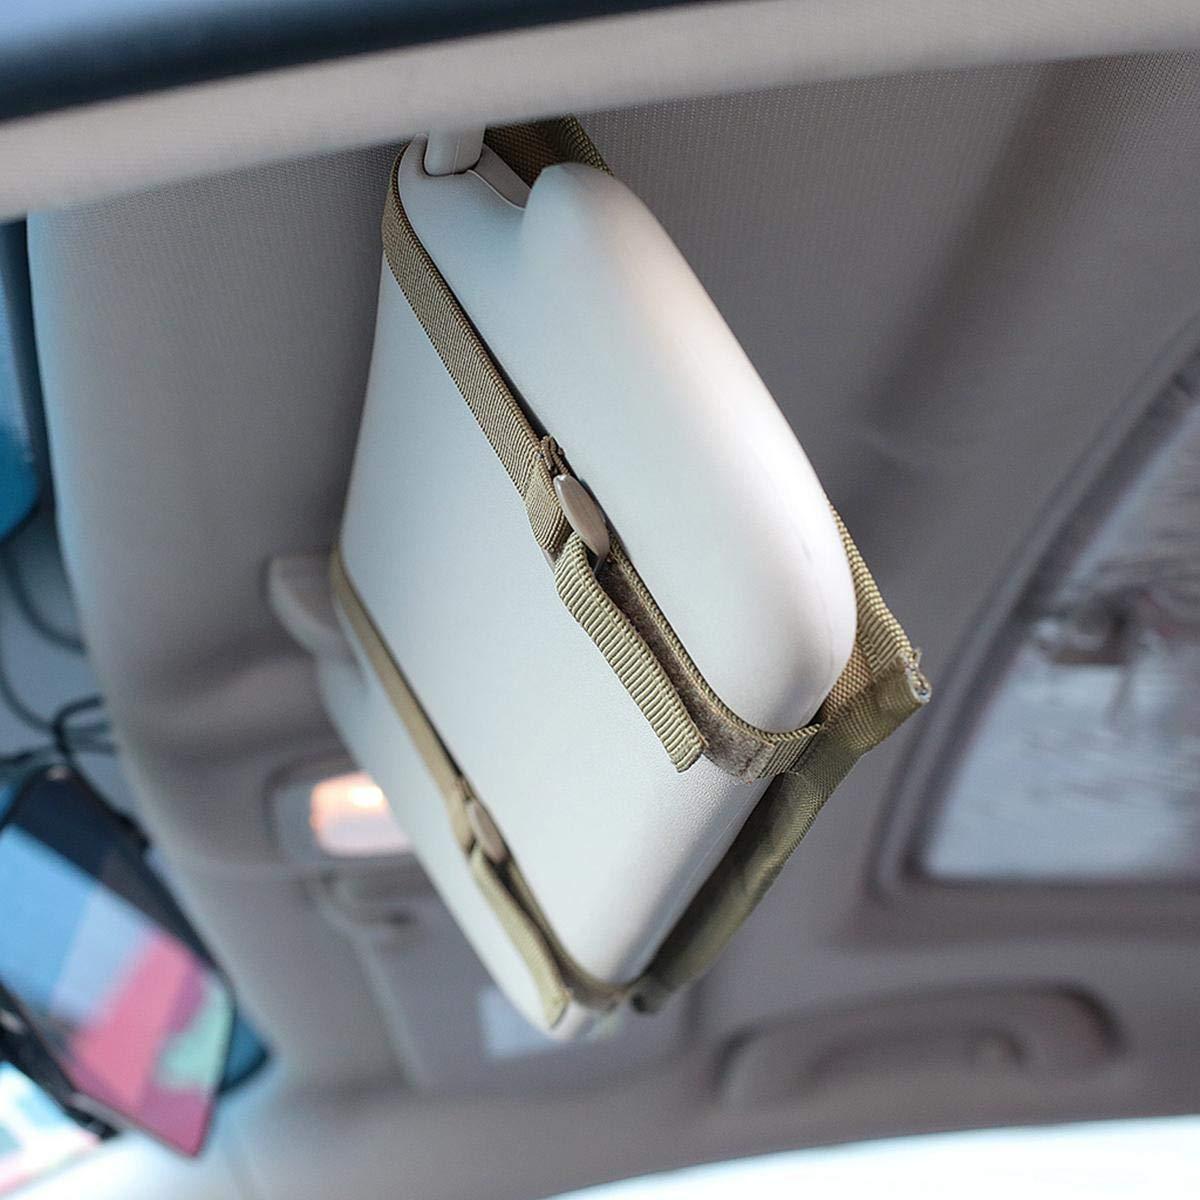 Foonee Molle Vehicle Sun Panel Organizer Pouch Truck Car Sun Visor Holder Bag CD Auto Accessories Holder Pouch Fits Most Vehicles 1 Pcs